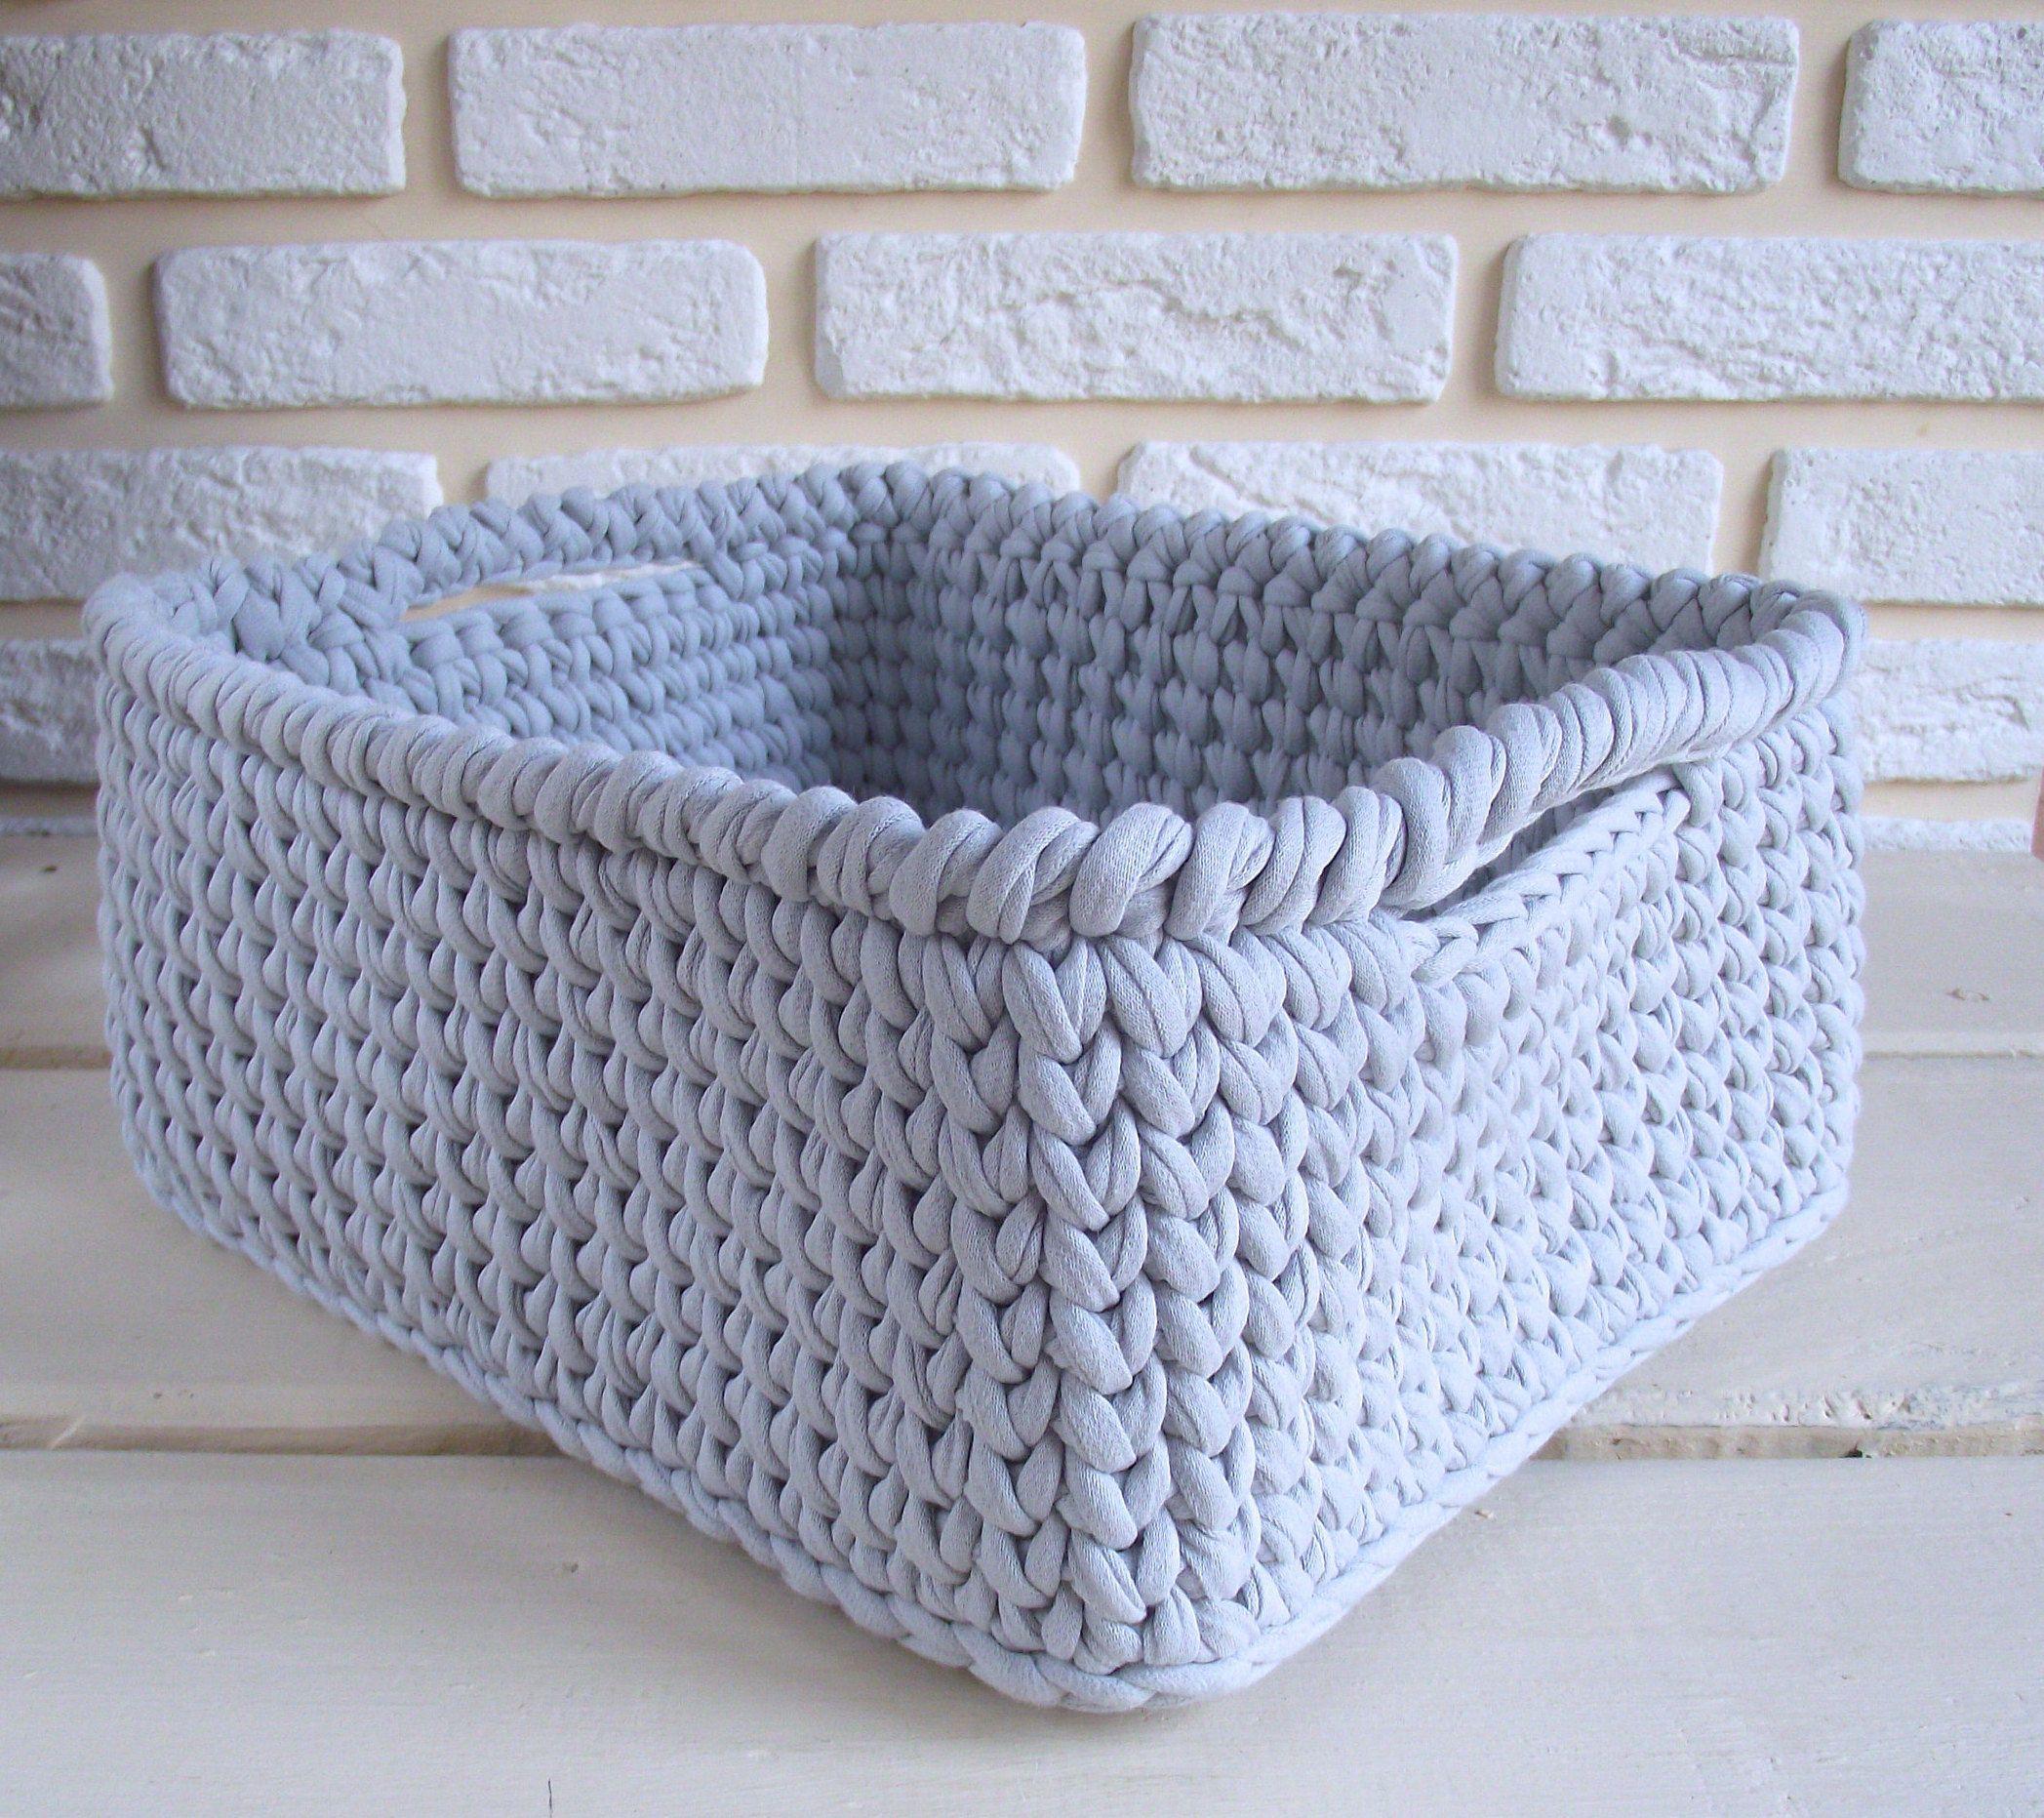 Crocheted Square Storage Basket 100 Cotton Yarn T Shirt